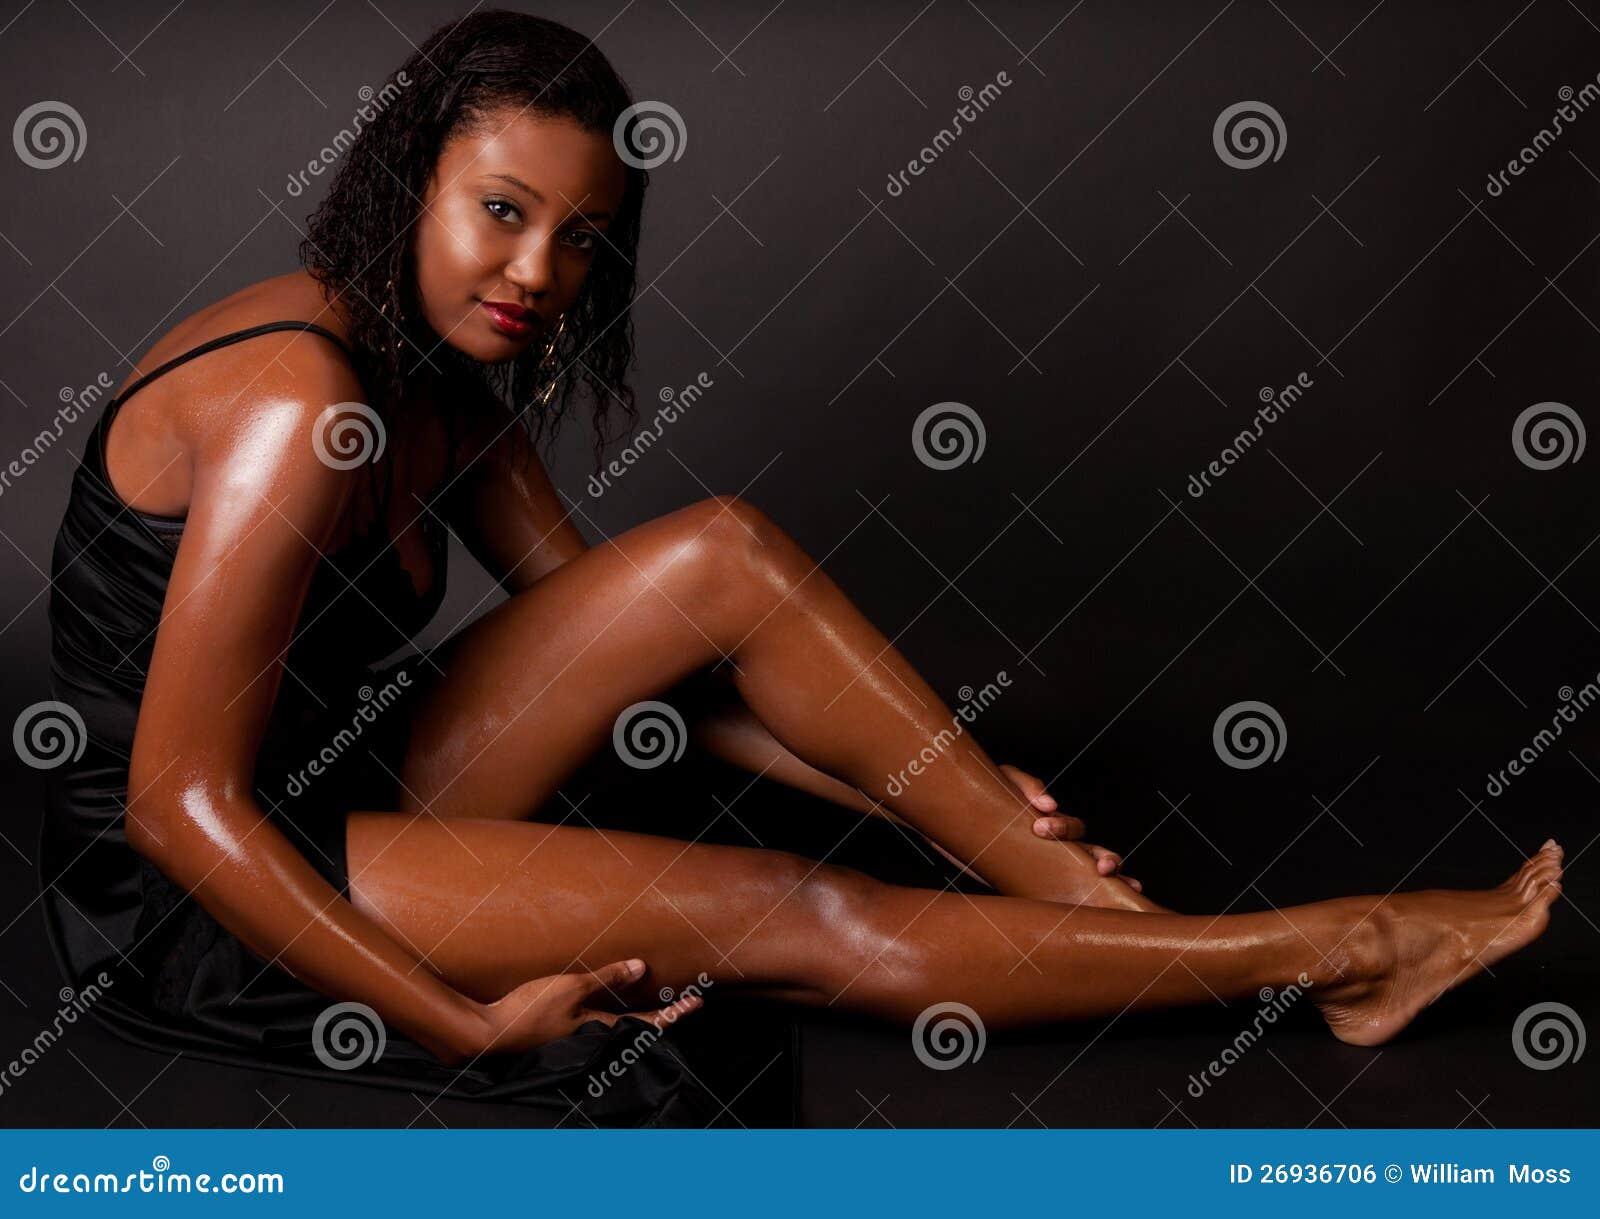 Patty brard nude